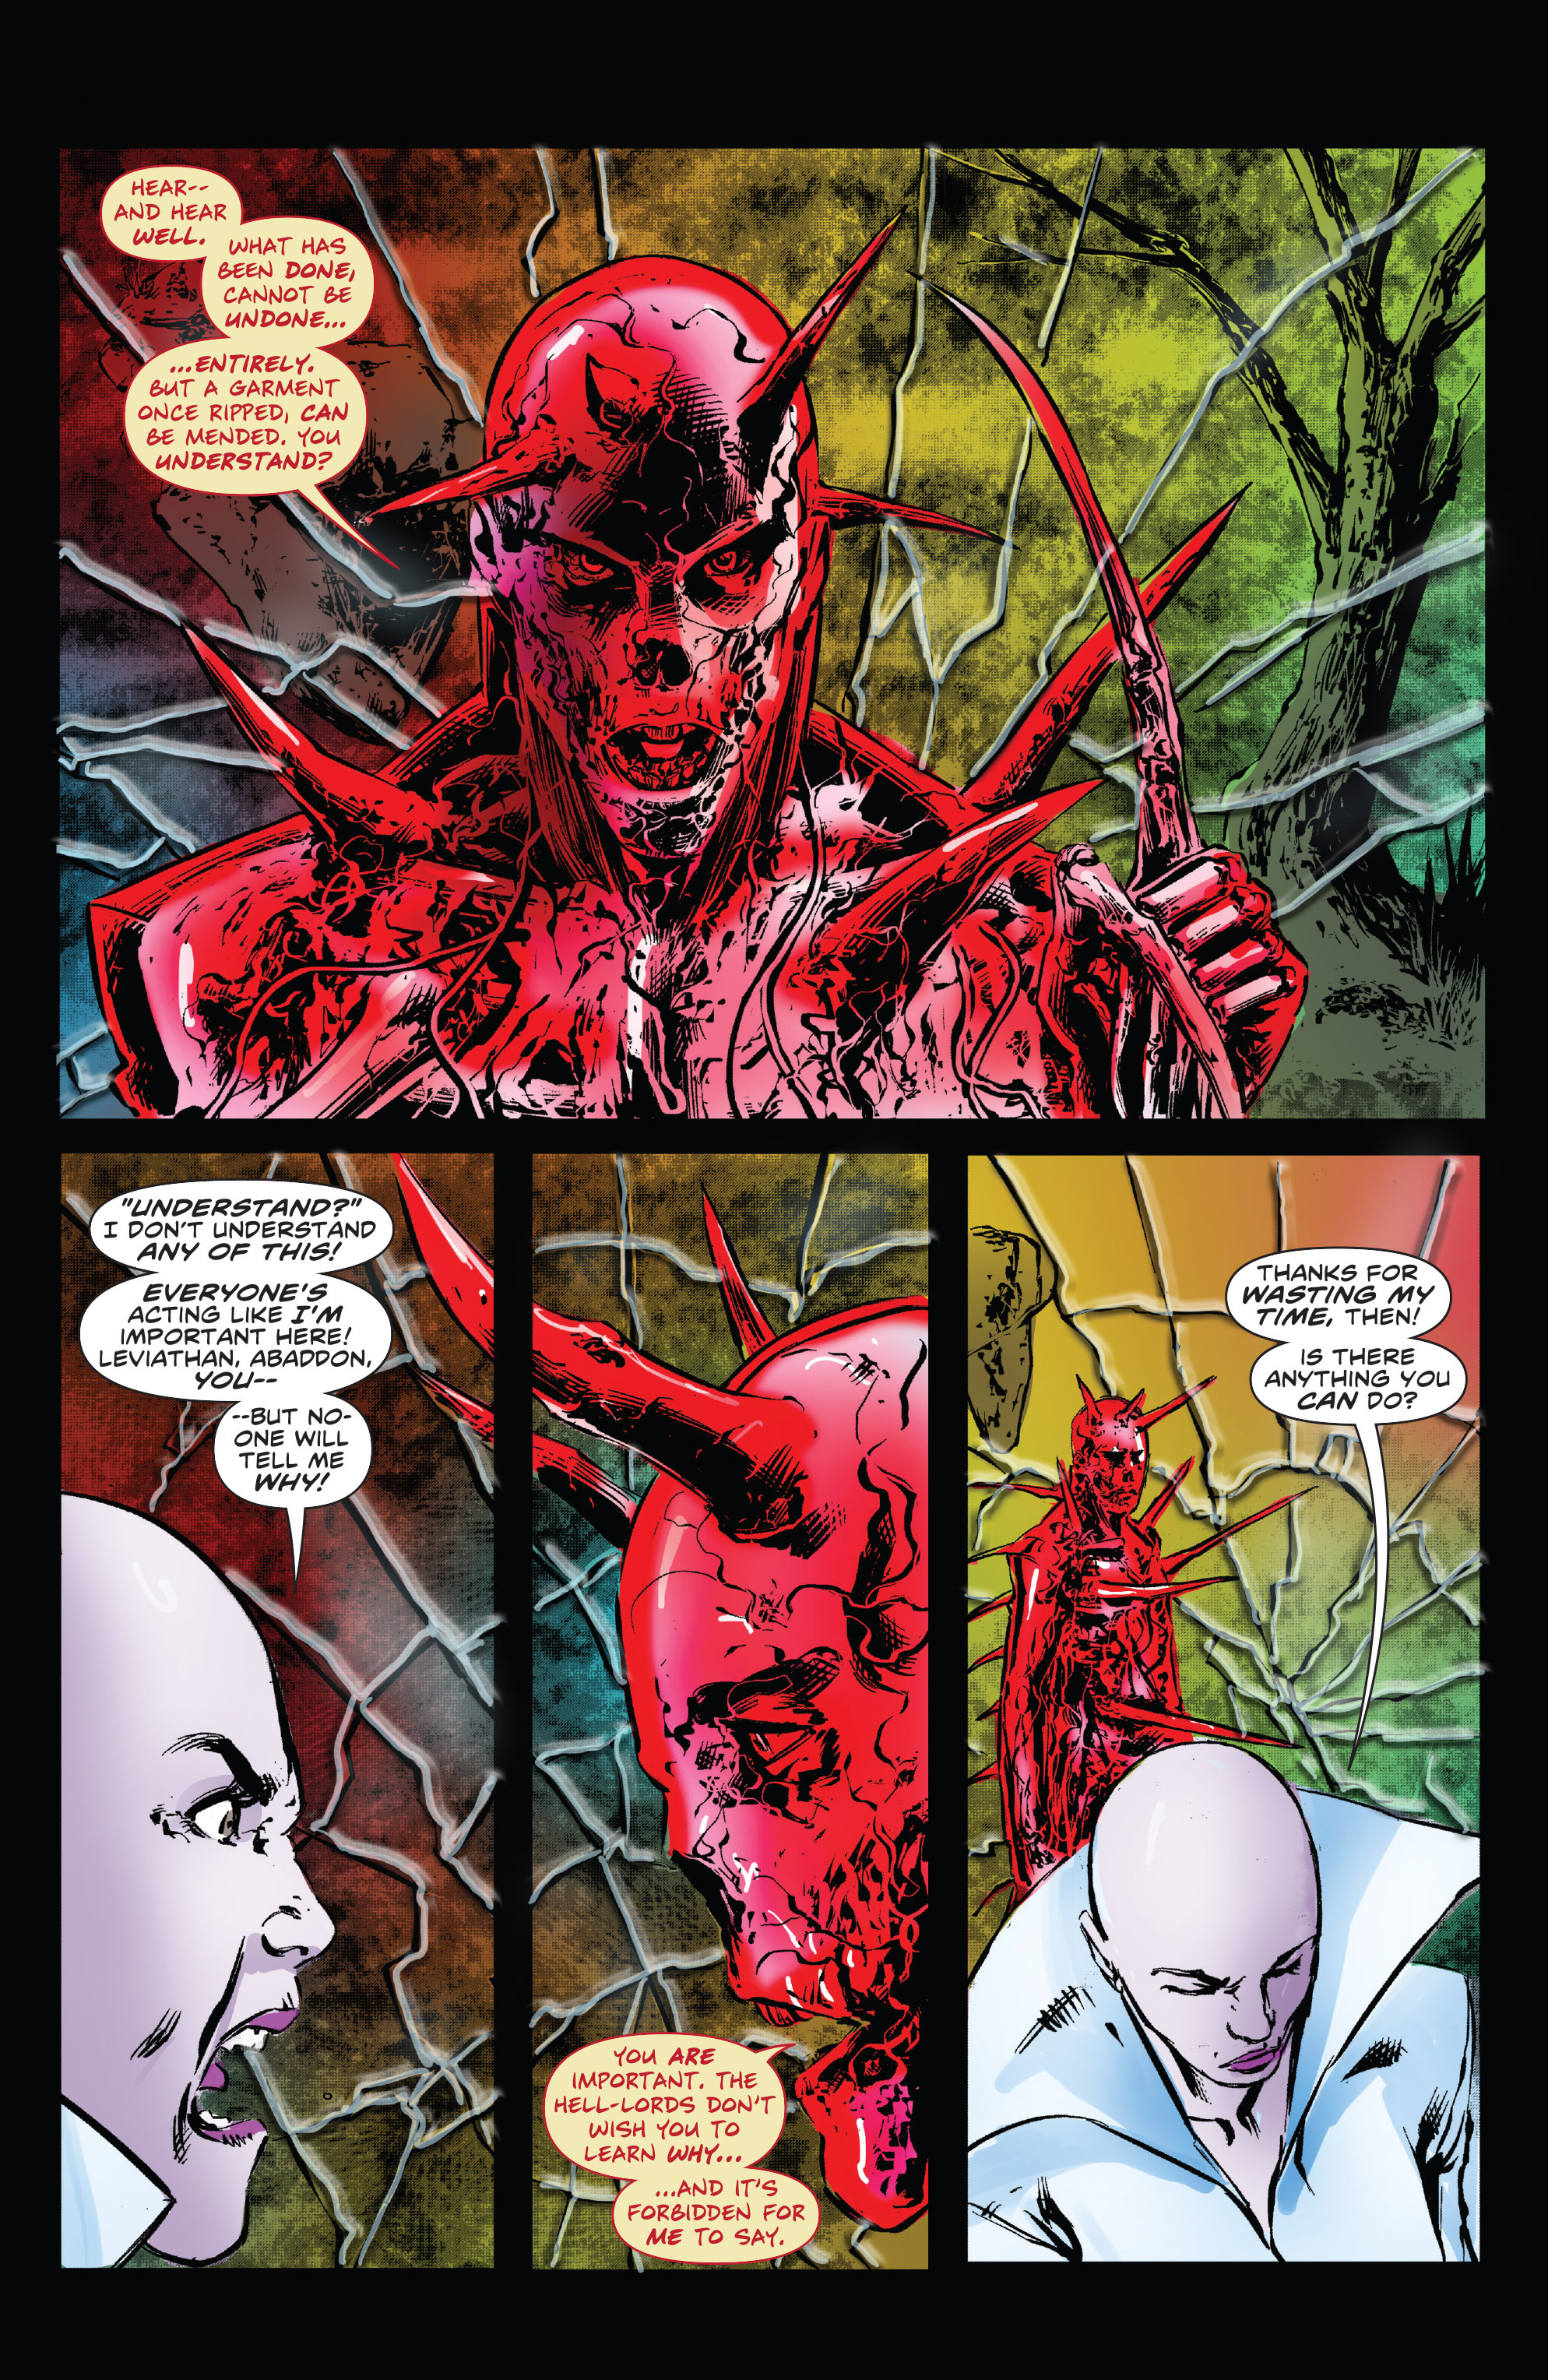 Read online Clive Barker's Hellraiser: The Dark Watch comic -  Issue # TPB 3 - 102